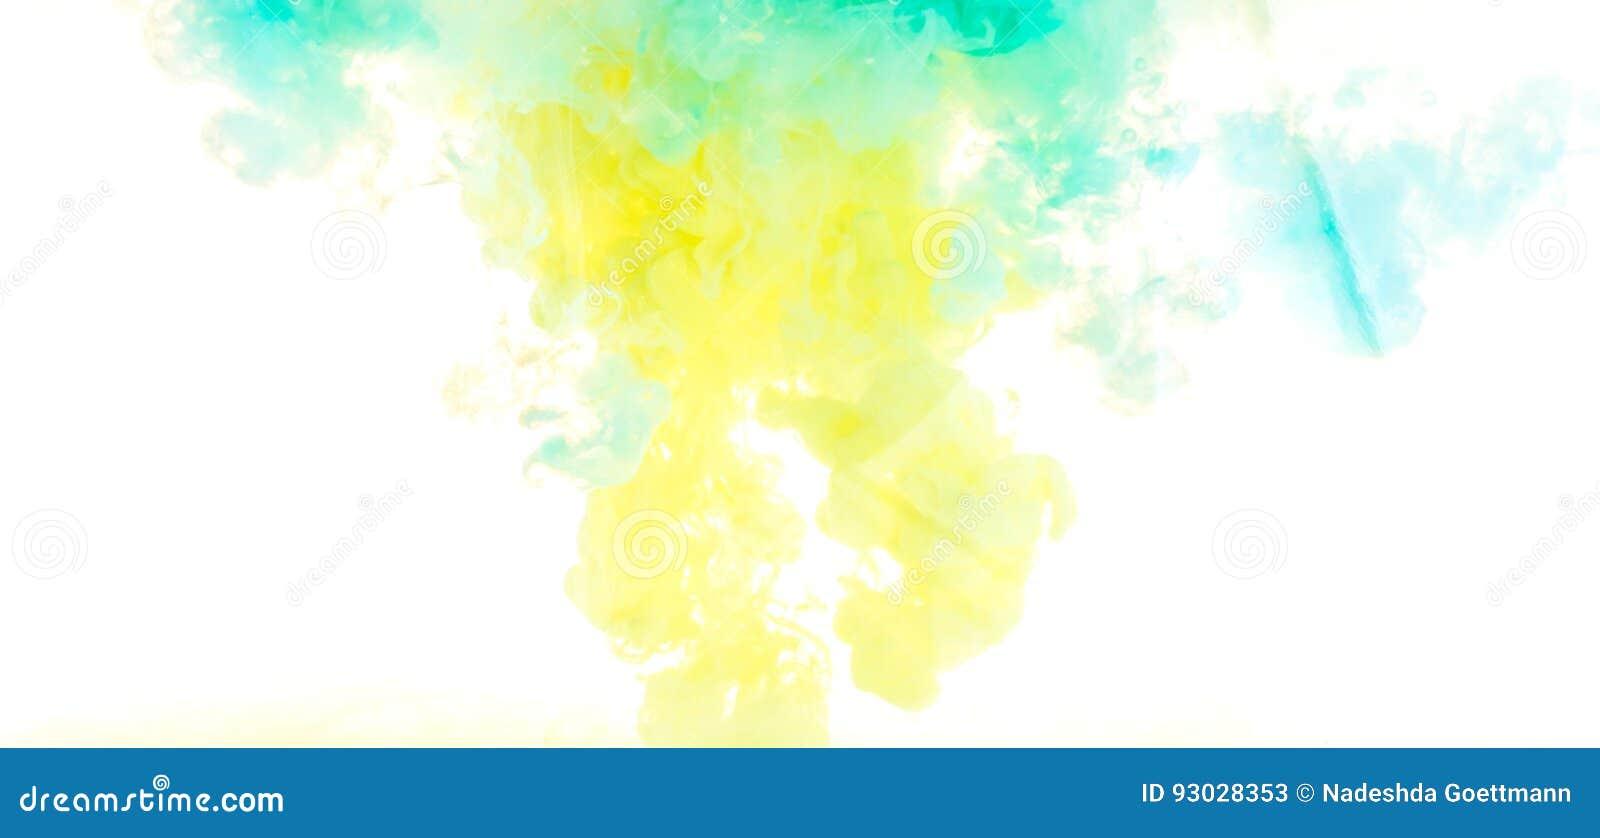 Tinta Cores acrílicas amarelas, azuis, e verdes Tinta que roda na água Explosão da cor